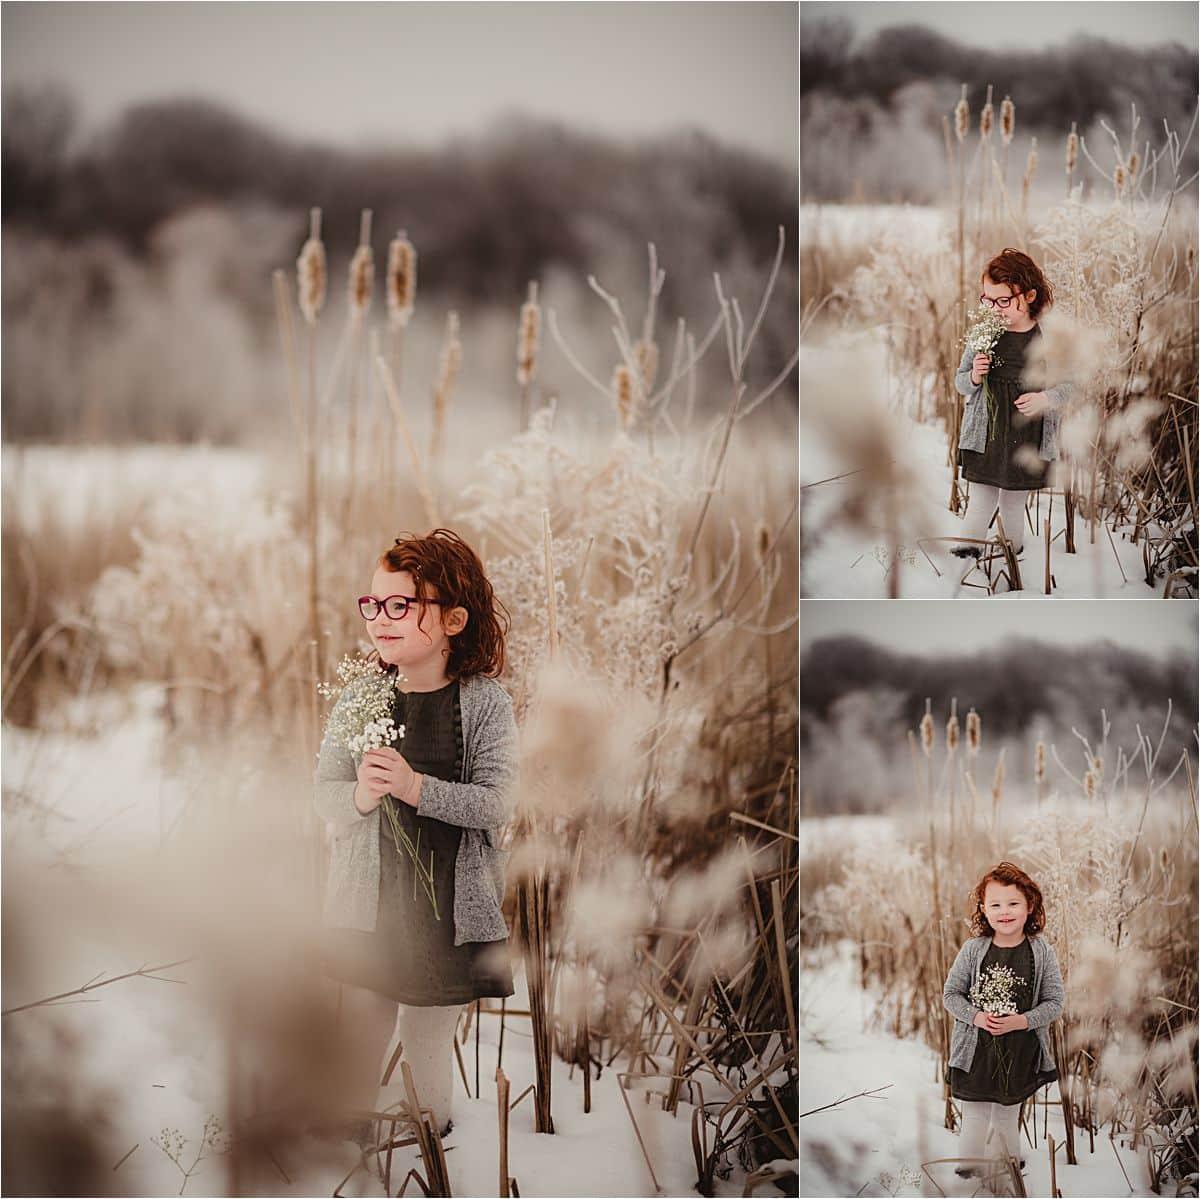 Little Girl Snow Field